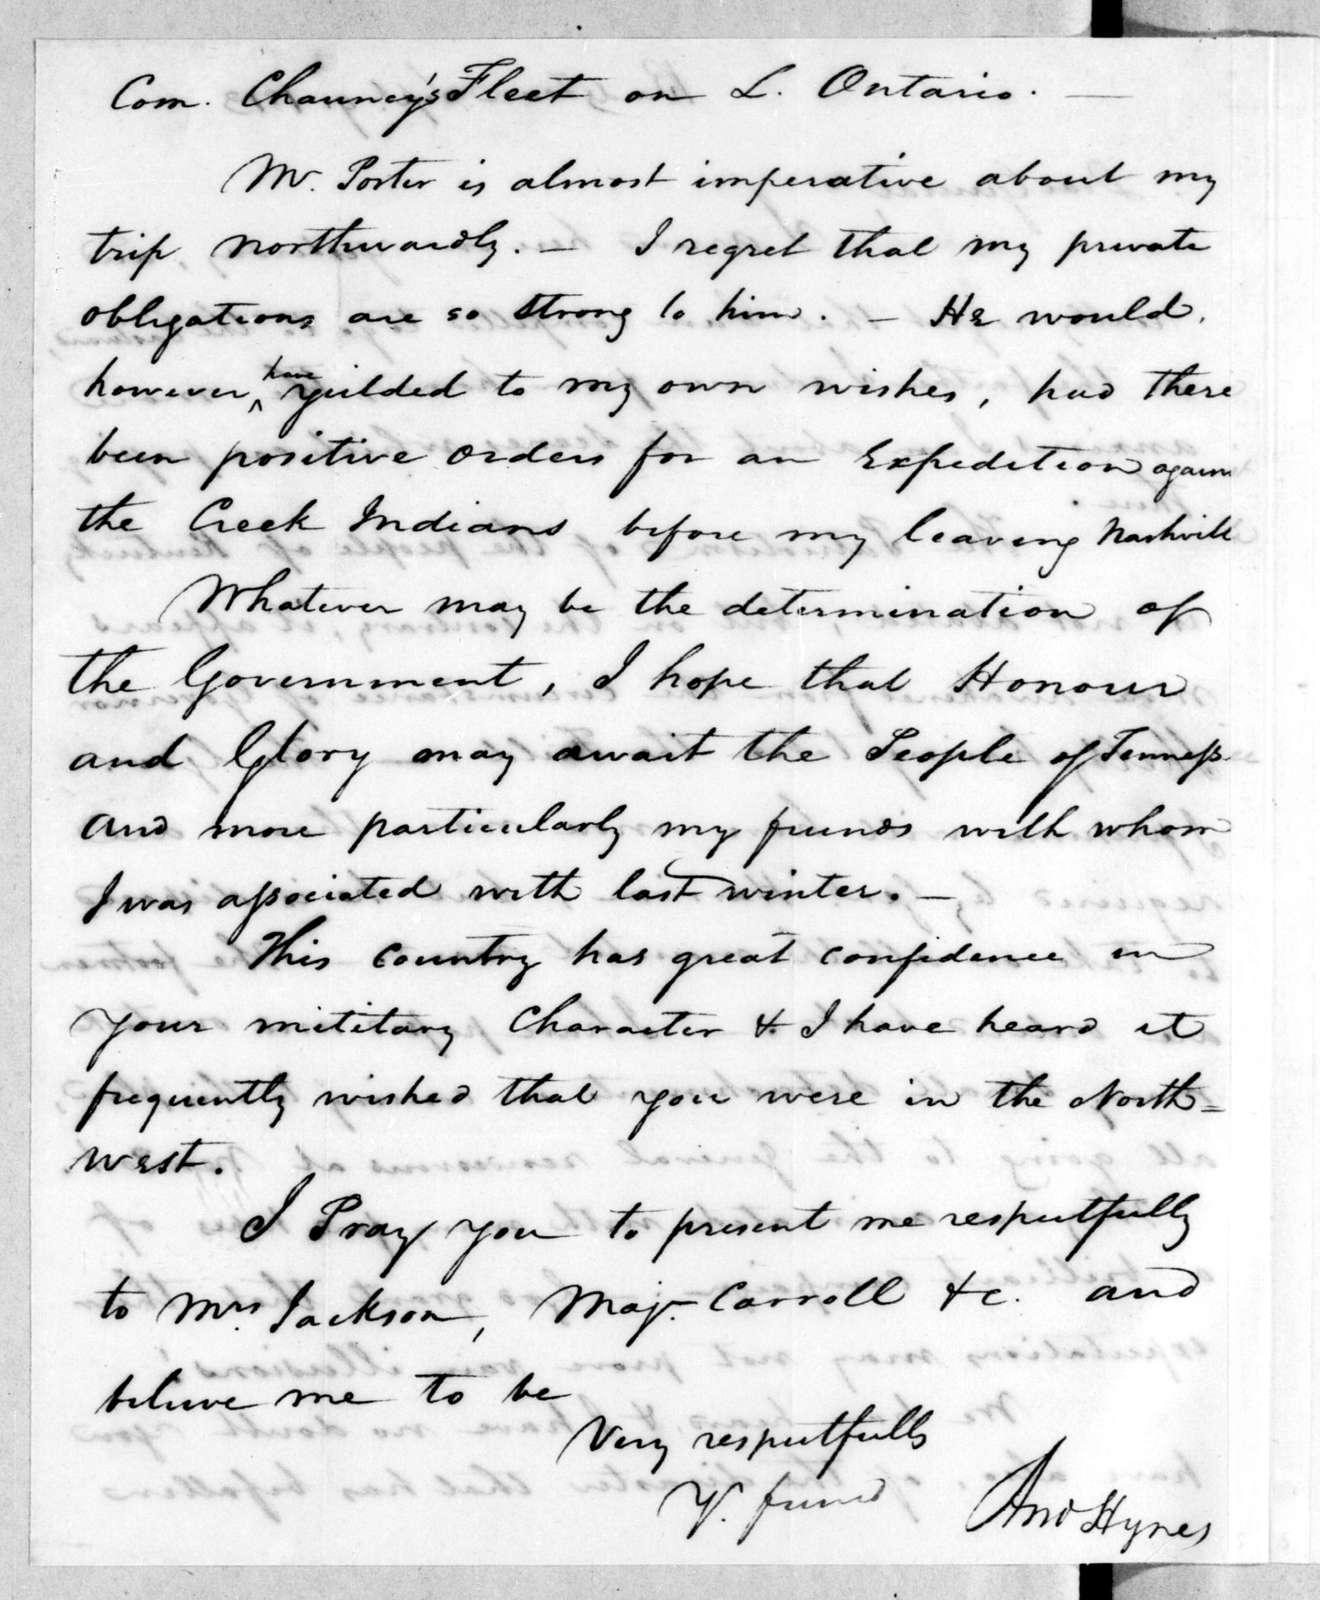 Andrew Hynes to Andrew Jackson, September 9, 1813